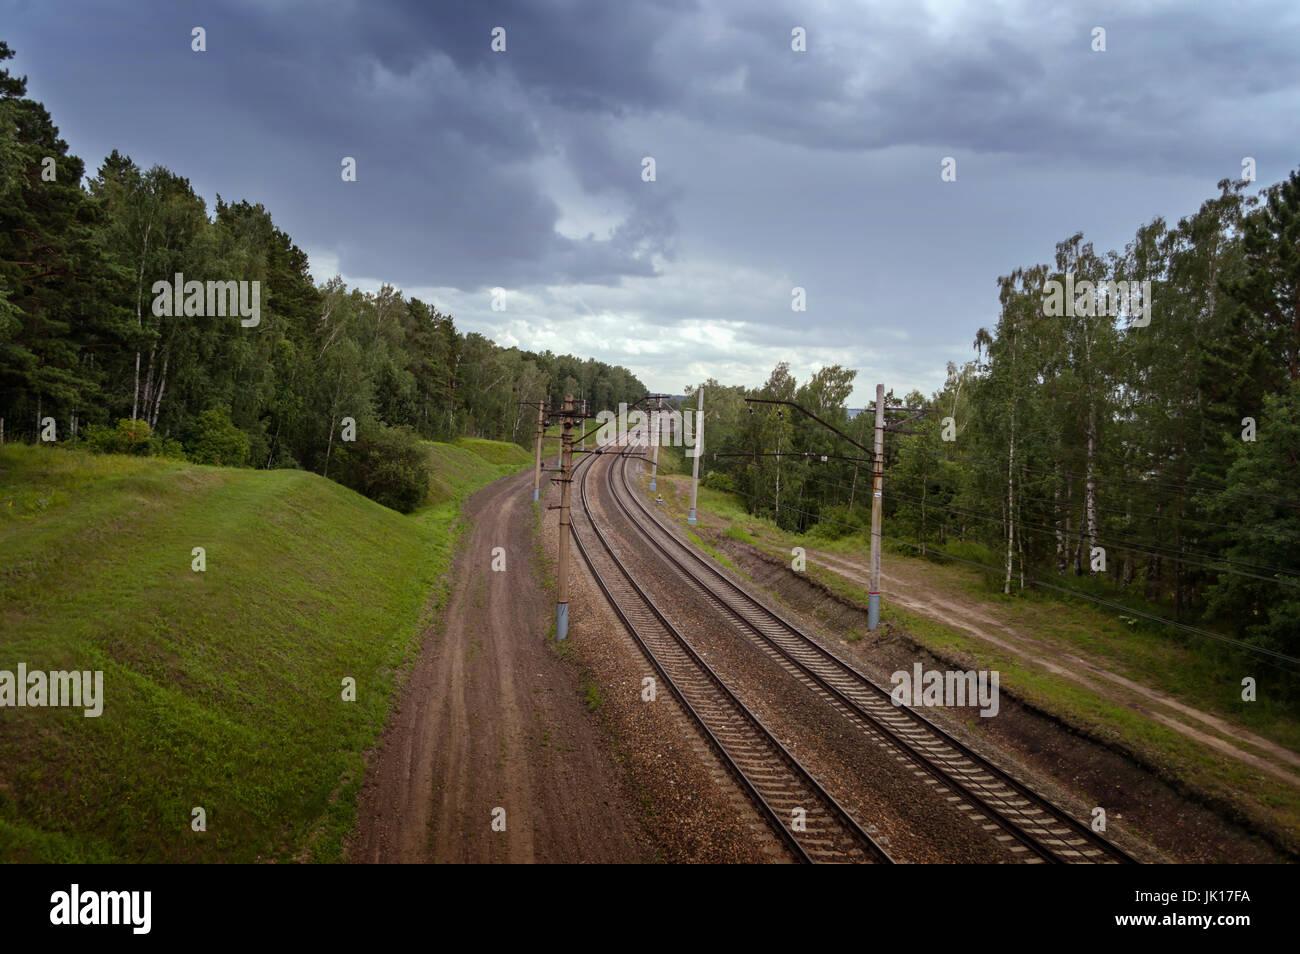 empty railway with dark skies - Stock Image